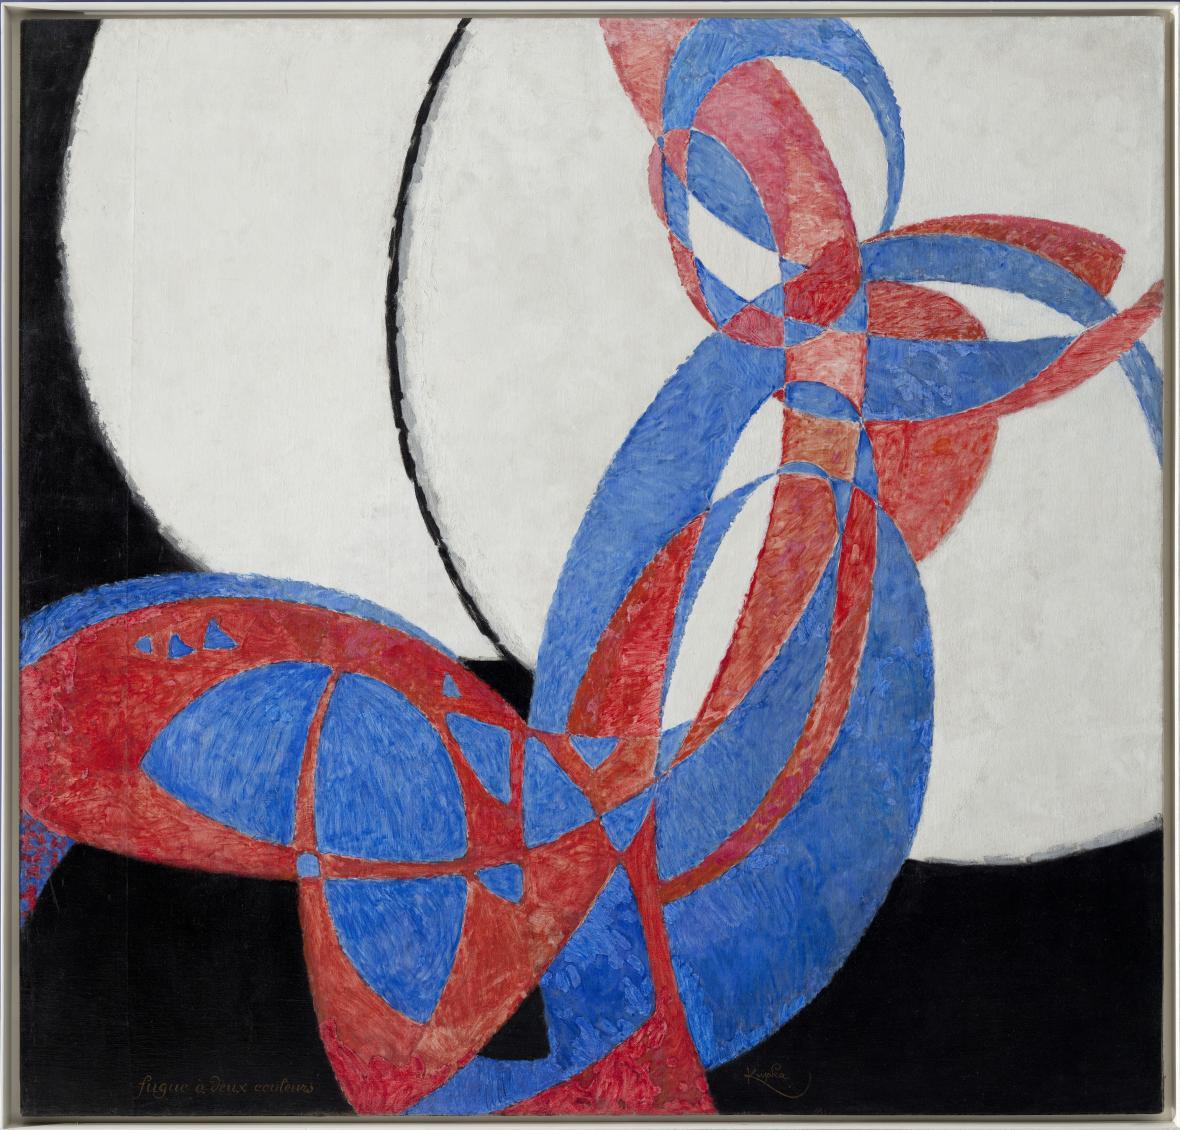 František Kupka / Amorfa. Dvojbarevná fuga, 1912